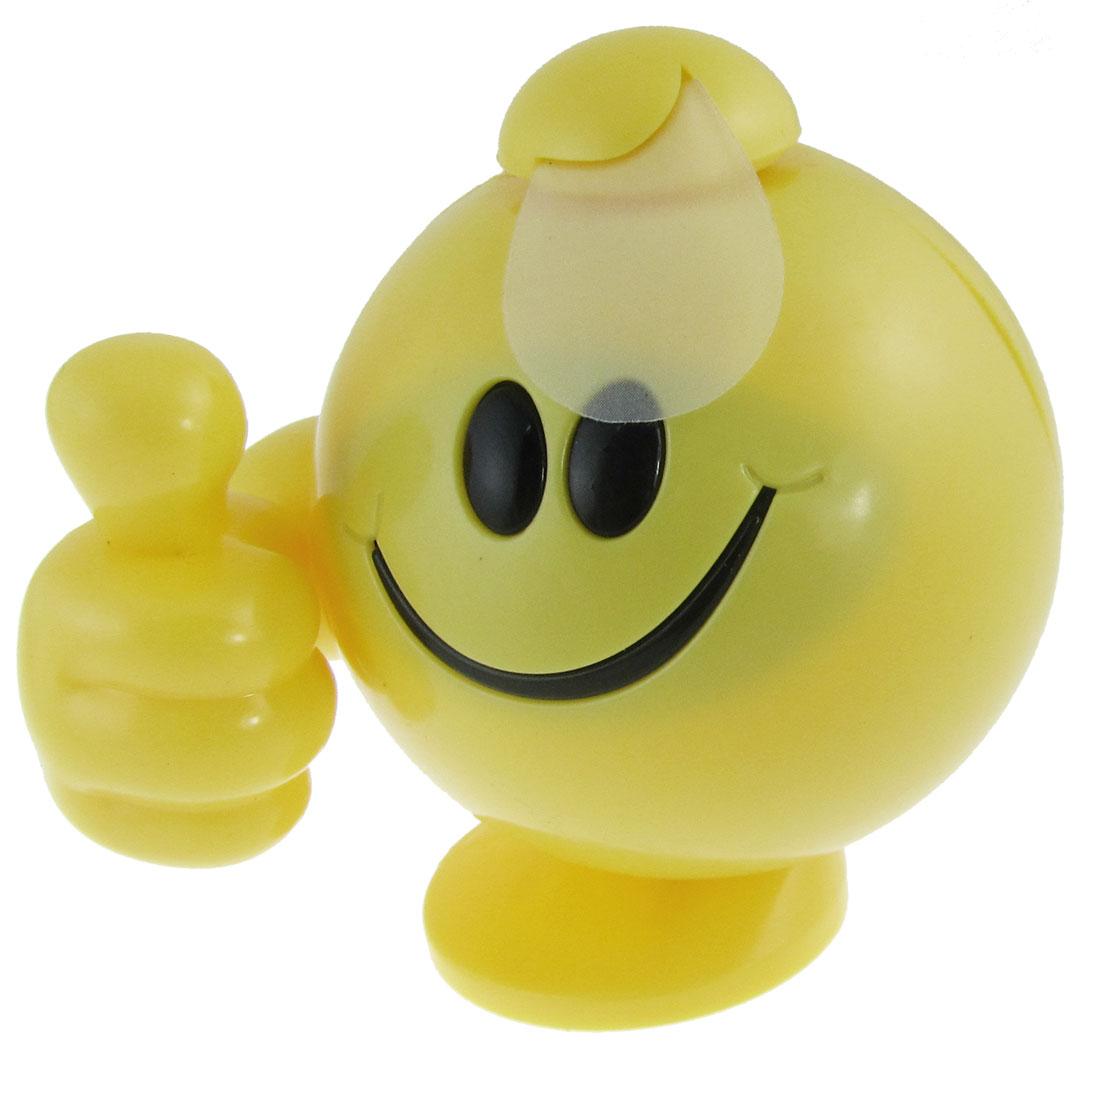 AAA 1.5V Yellow Plastic Thumb Battery Operated Mini Pocket Fan